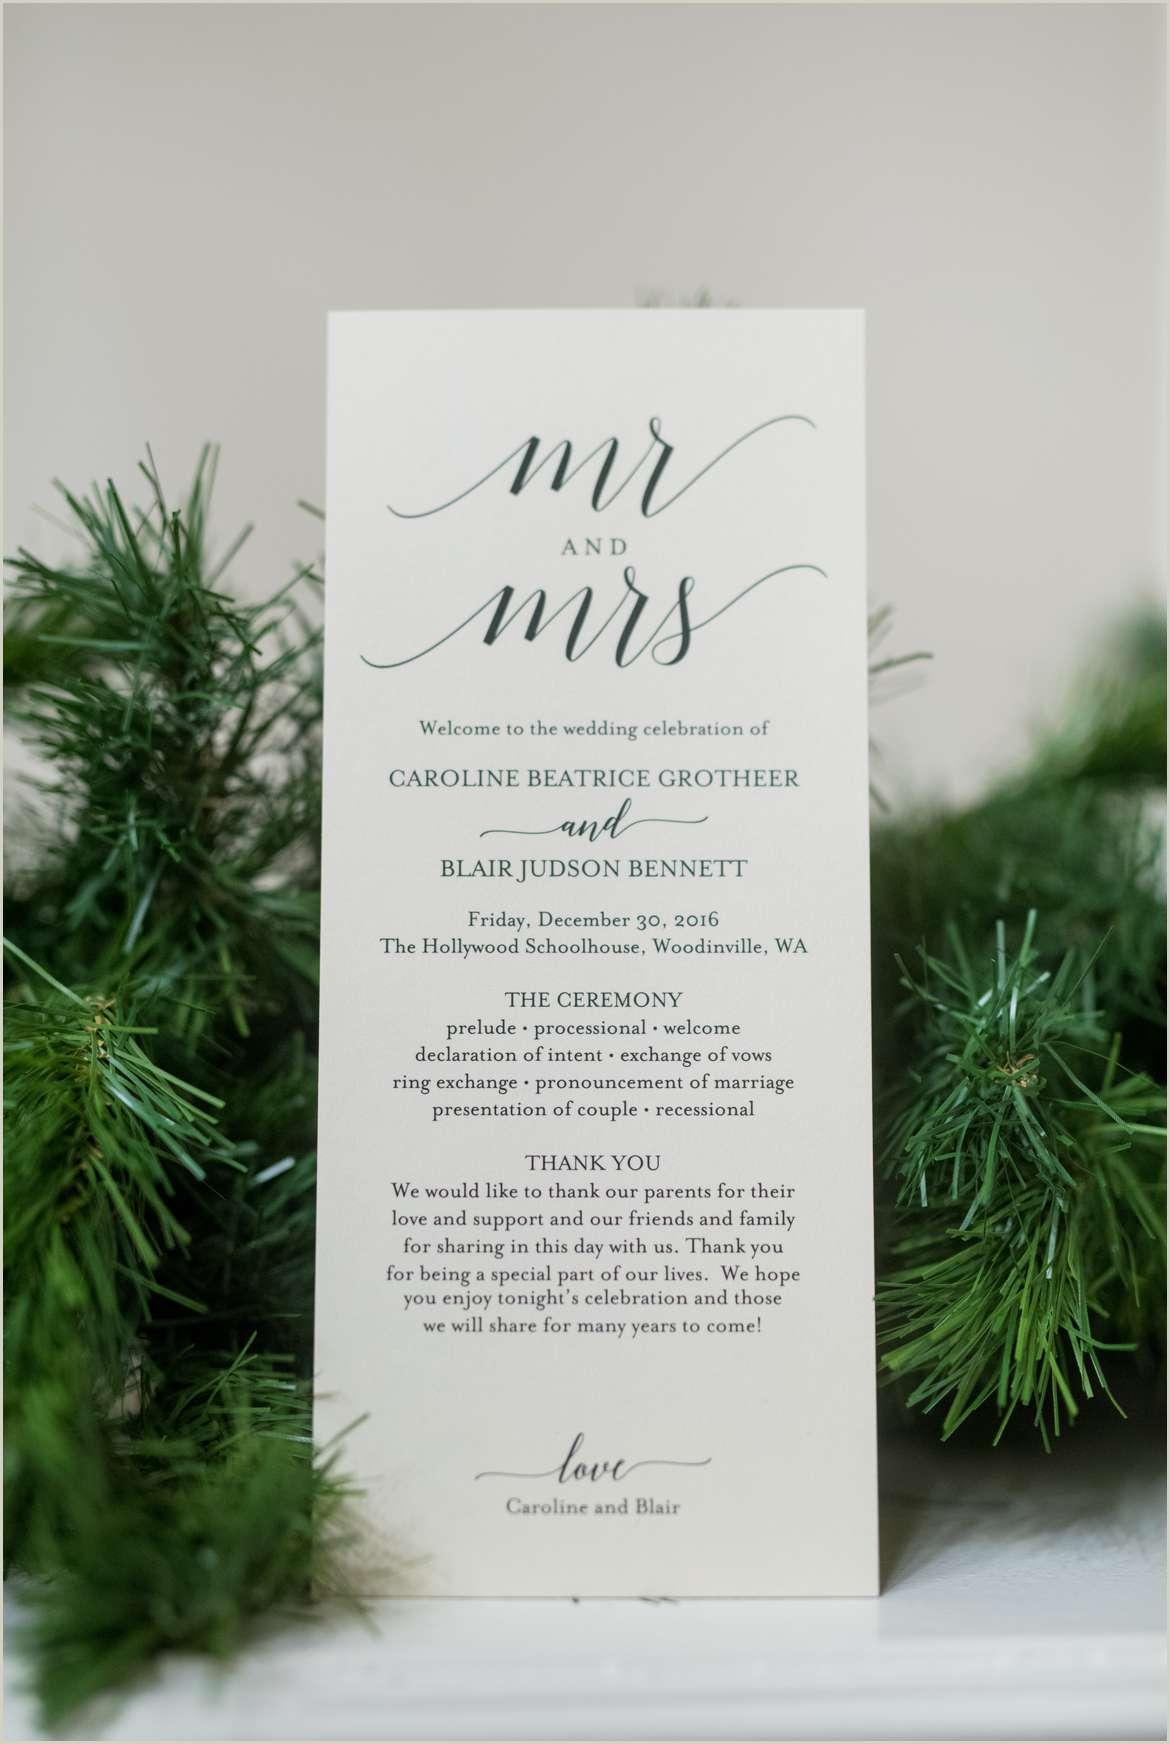 classic winter wedding style program 1